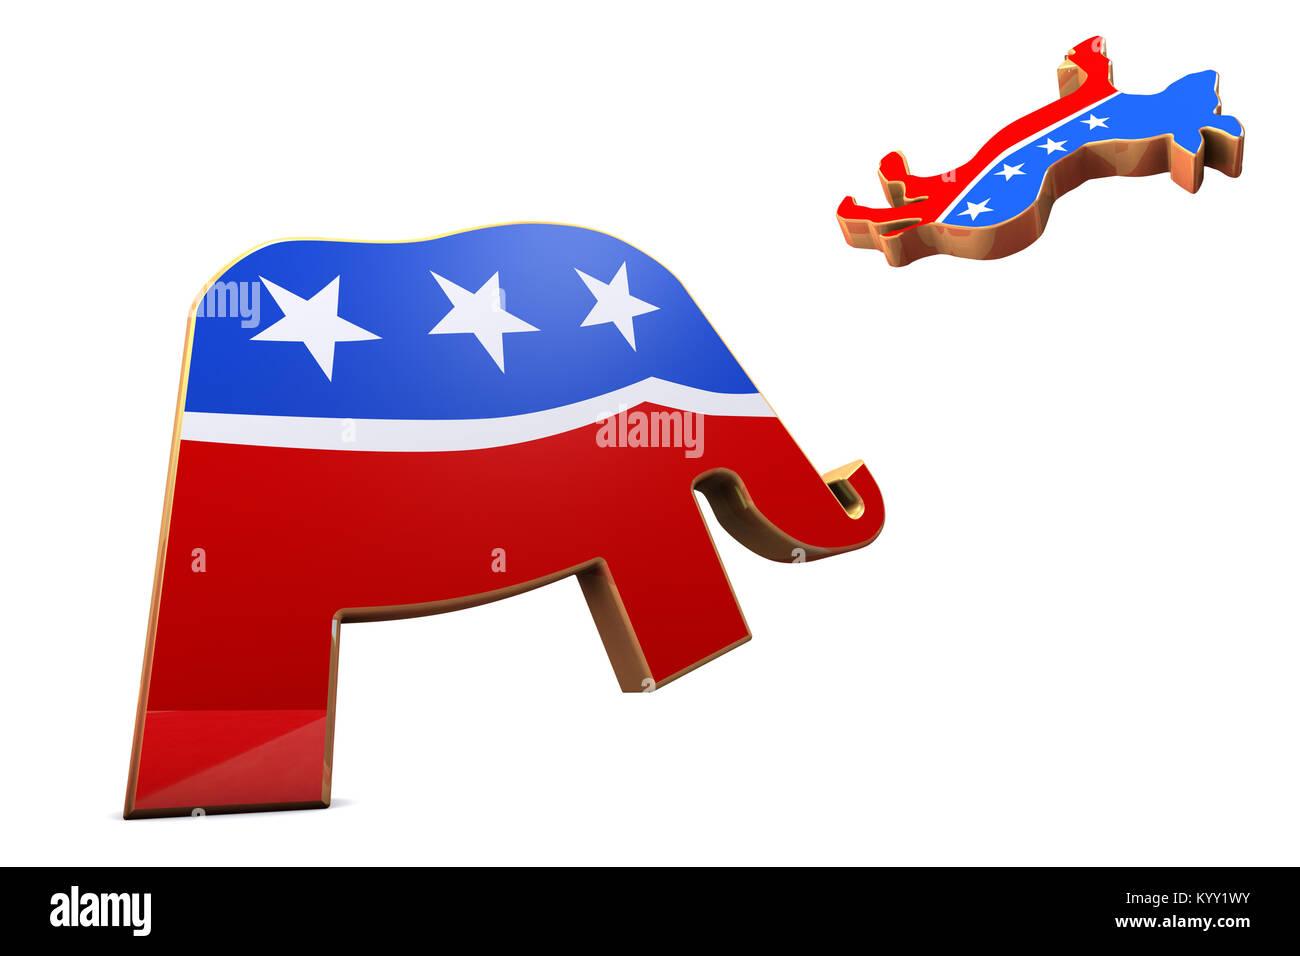 Usa political parties symbols stock photos usa political parties democrat party and republican party symbols stock image biocorpaavc Choice Image